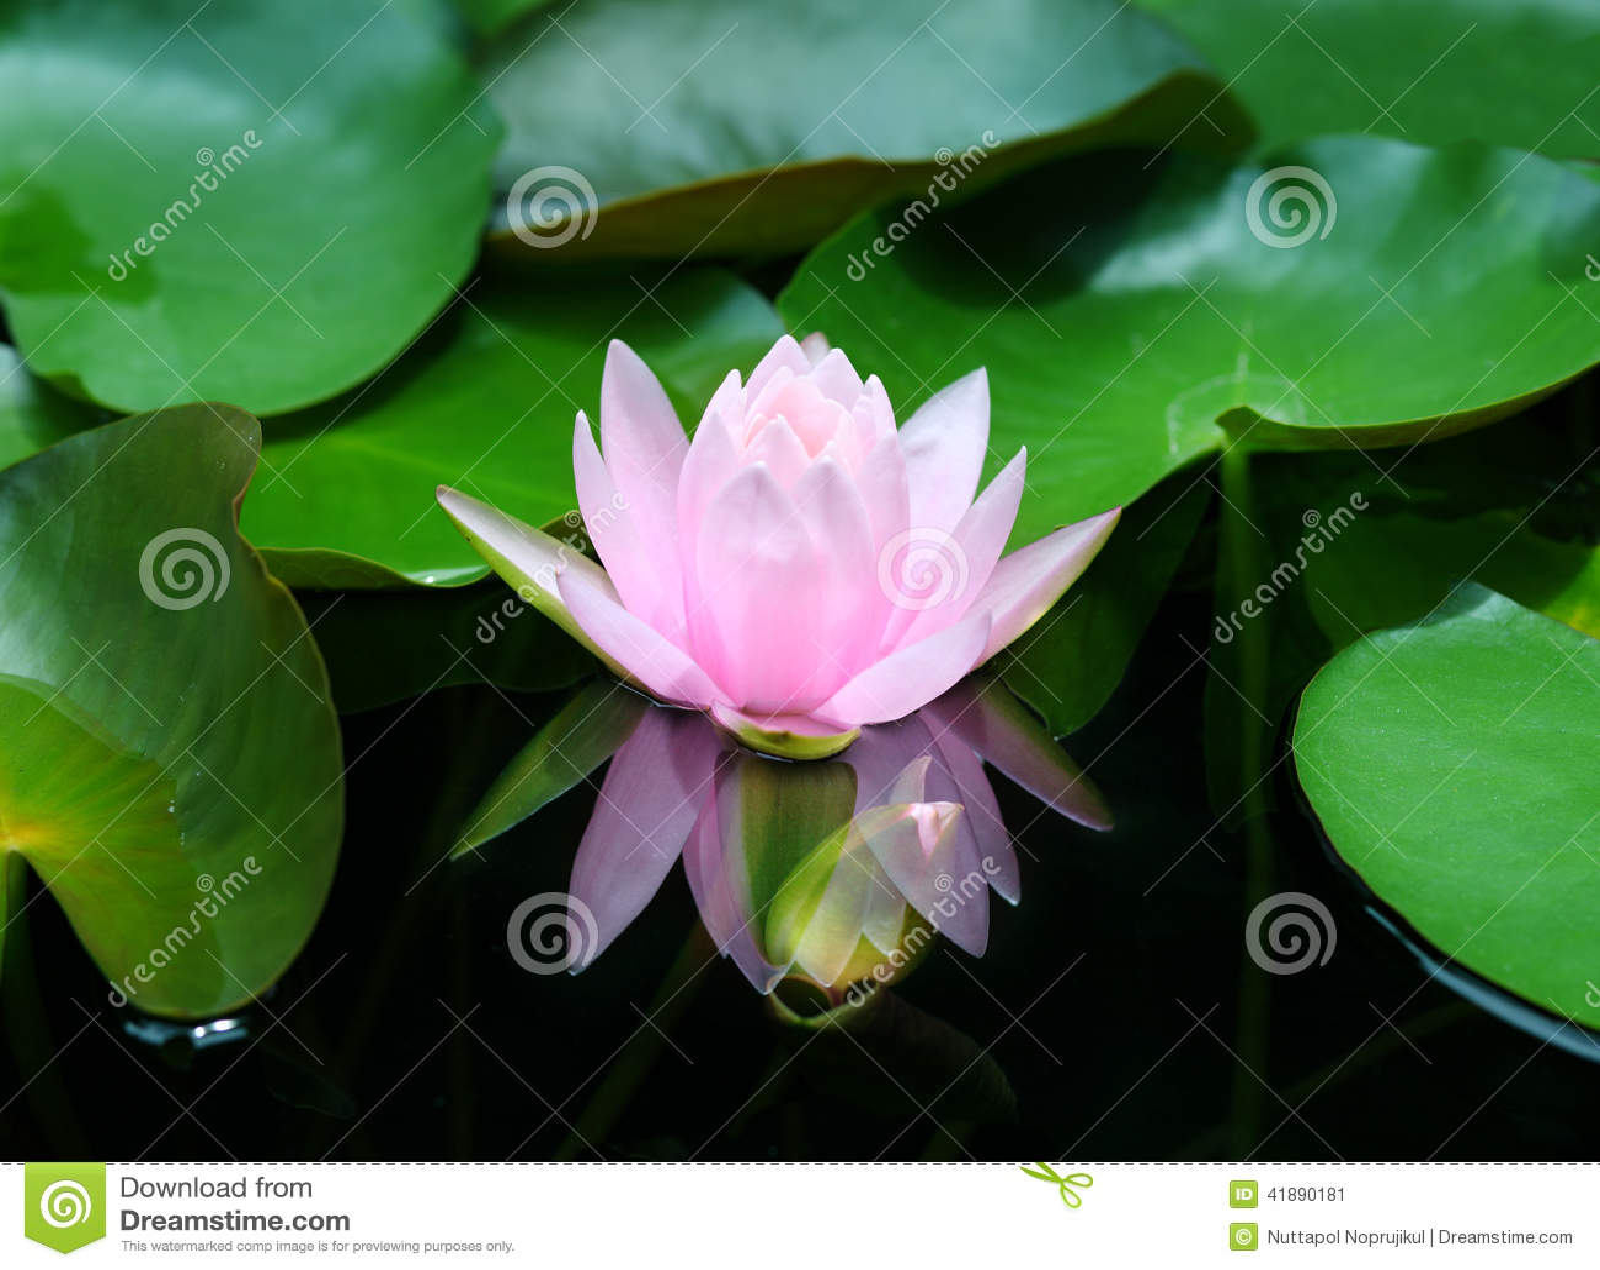 Lotus flower reflection water pond blooming pink water lily download lotus flower reflection water pond blooming pink water lily stock image image izmirmasajfo